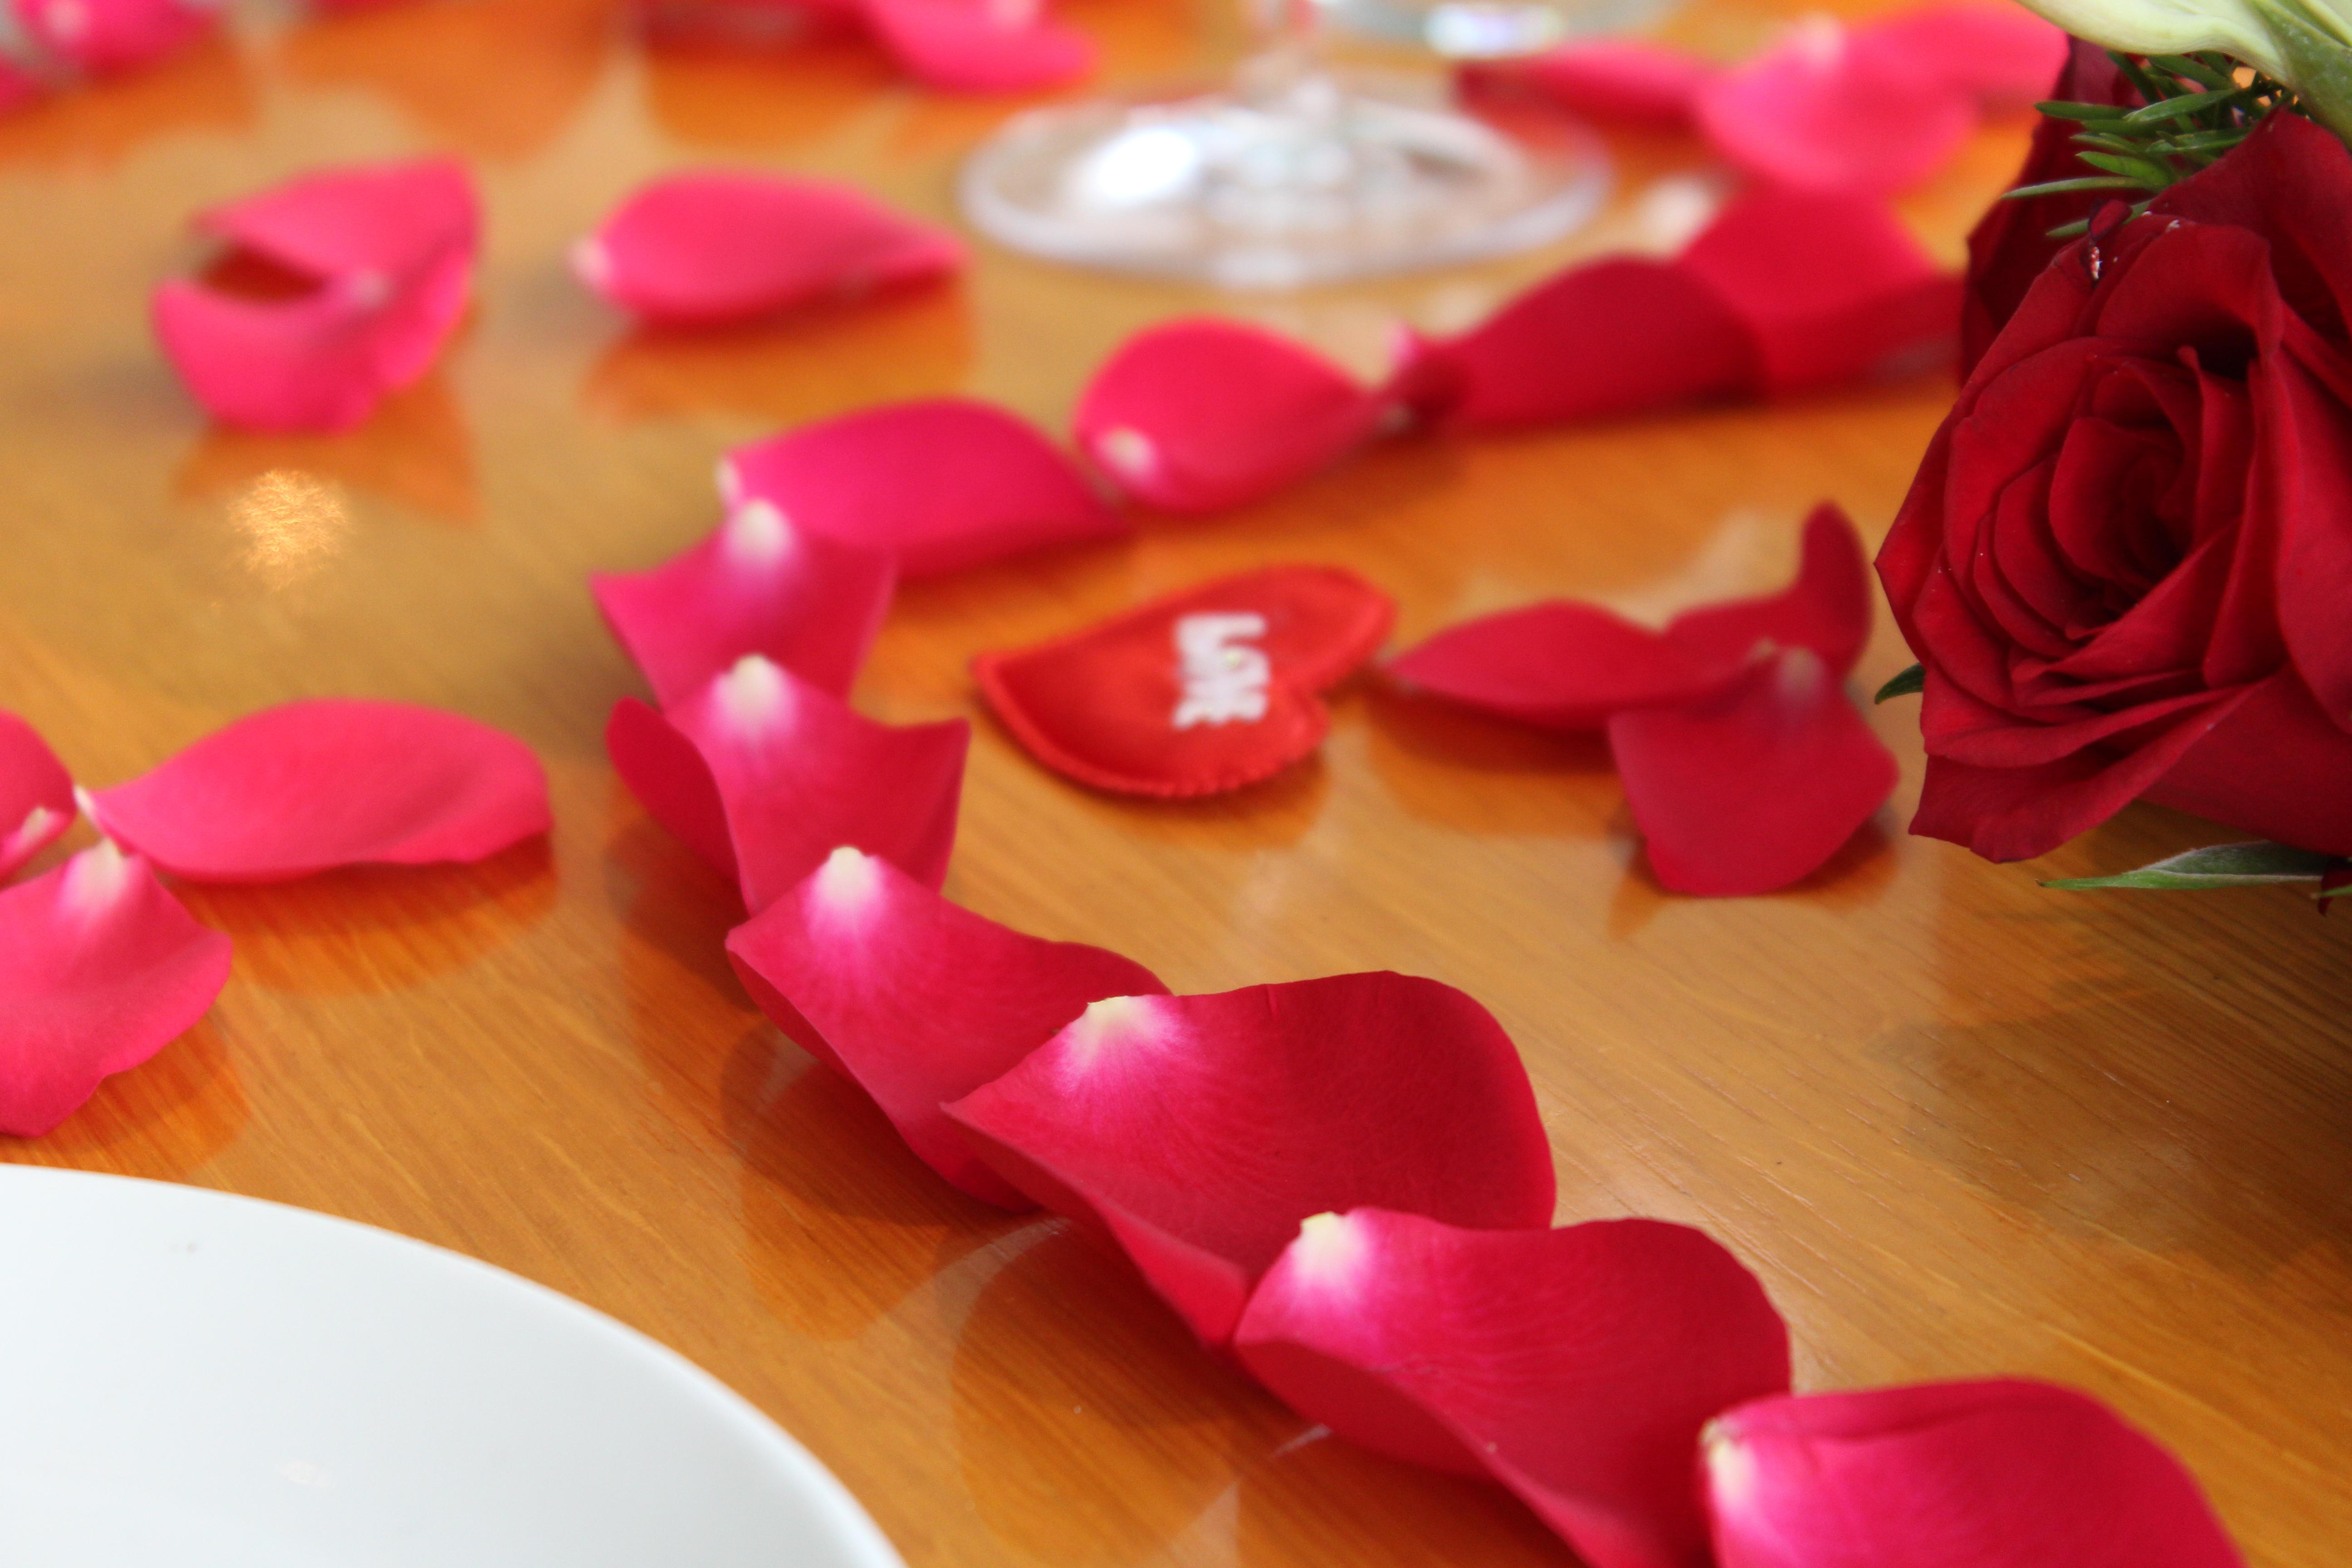 Free Images : flower, petal, love, heart, rose, food, red